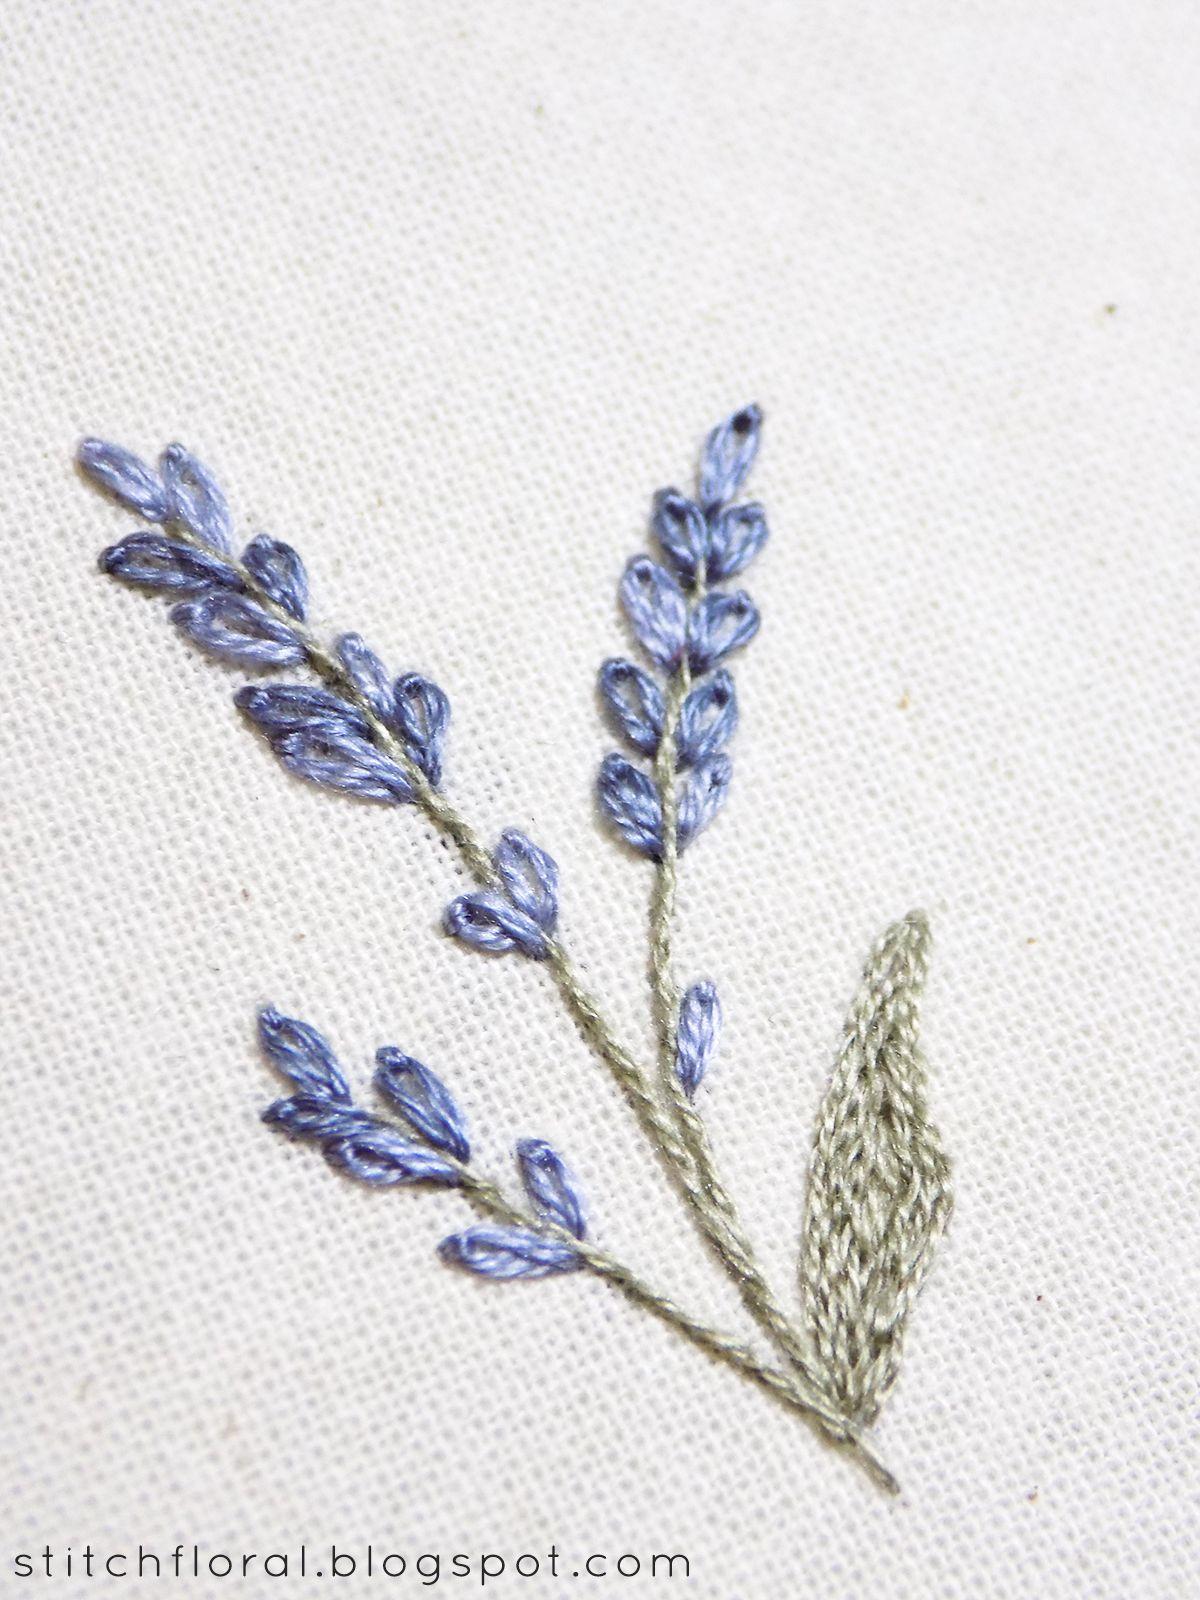 Lavender Embroidered Miniature Miniature Embroidery Sewing Embroidery Designs Embroidery Flowers Pattern